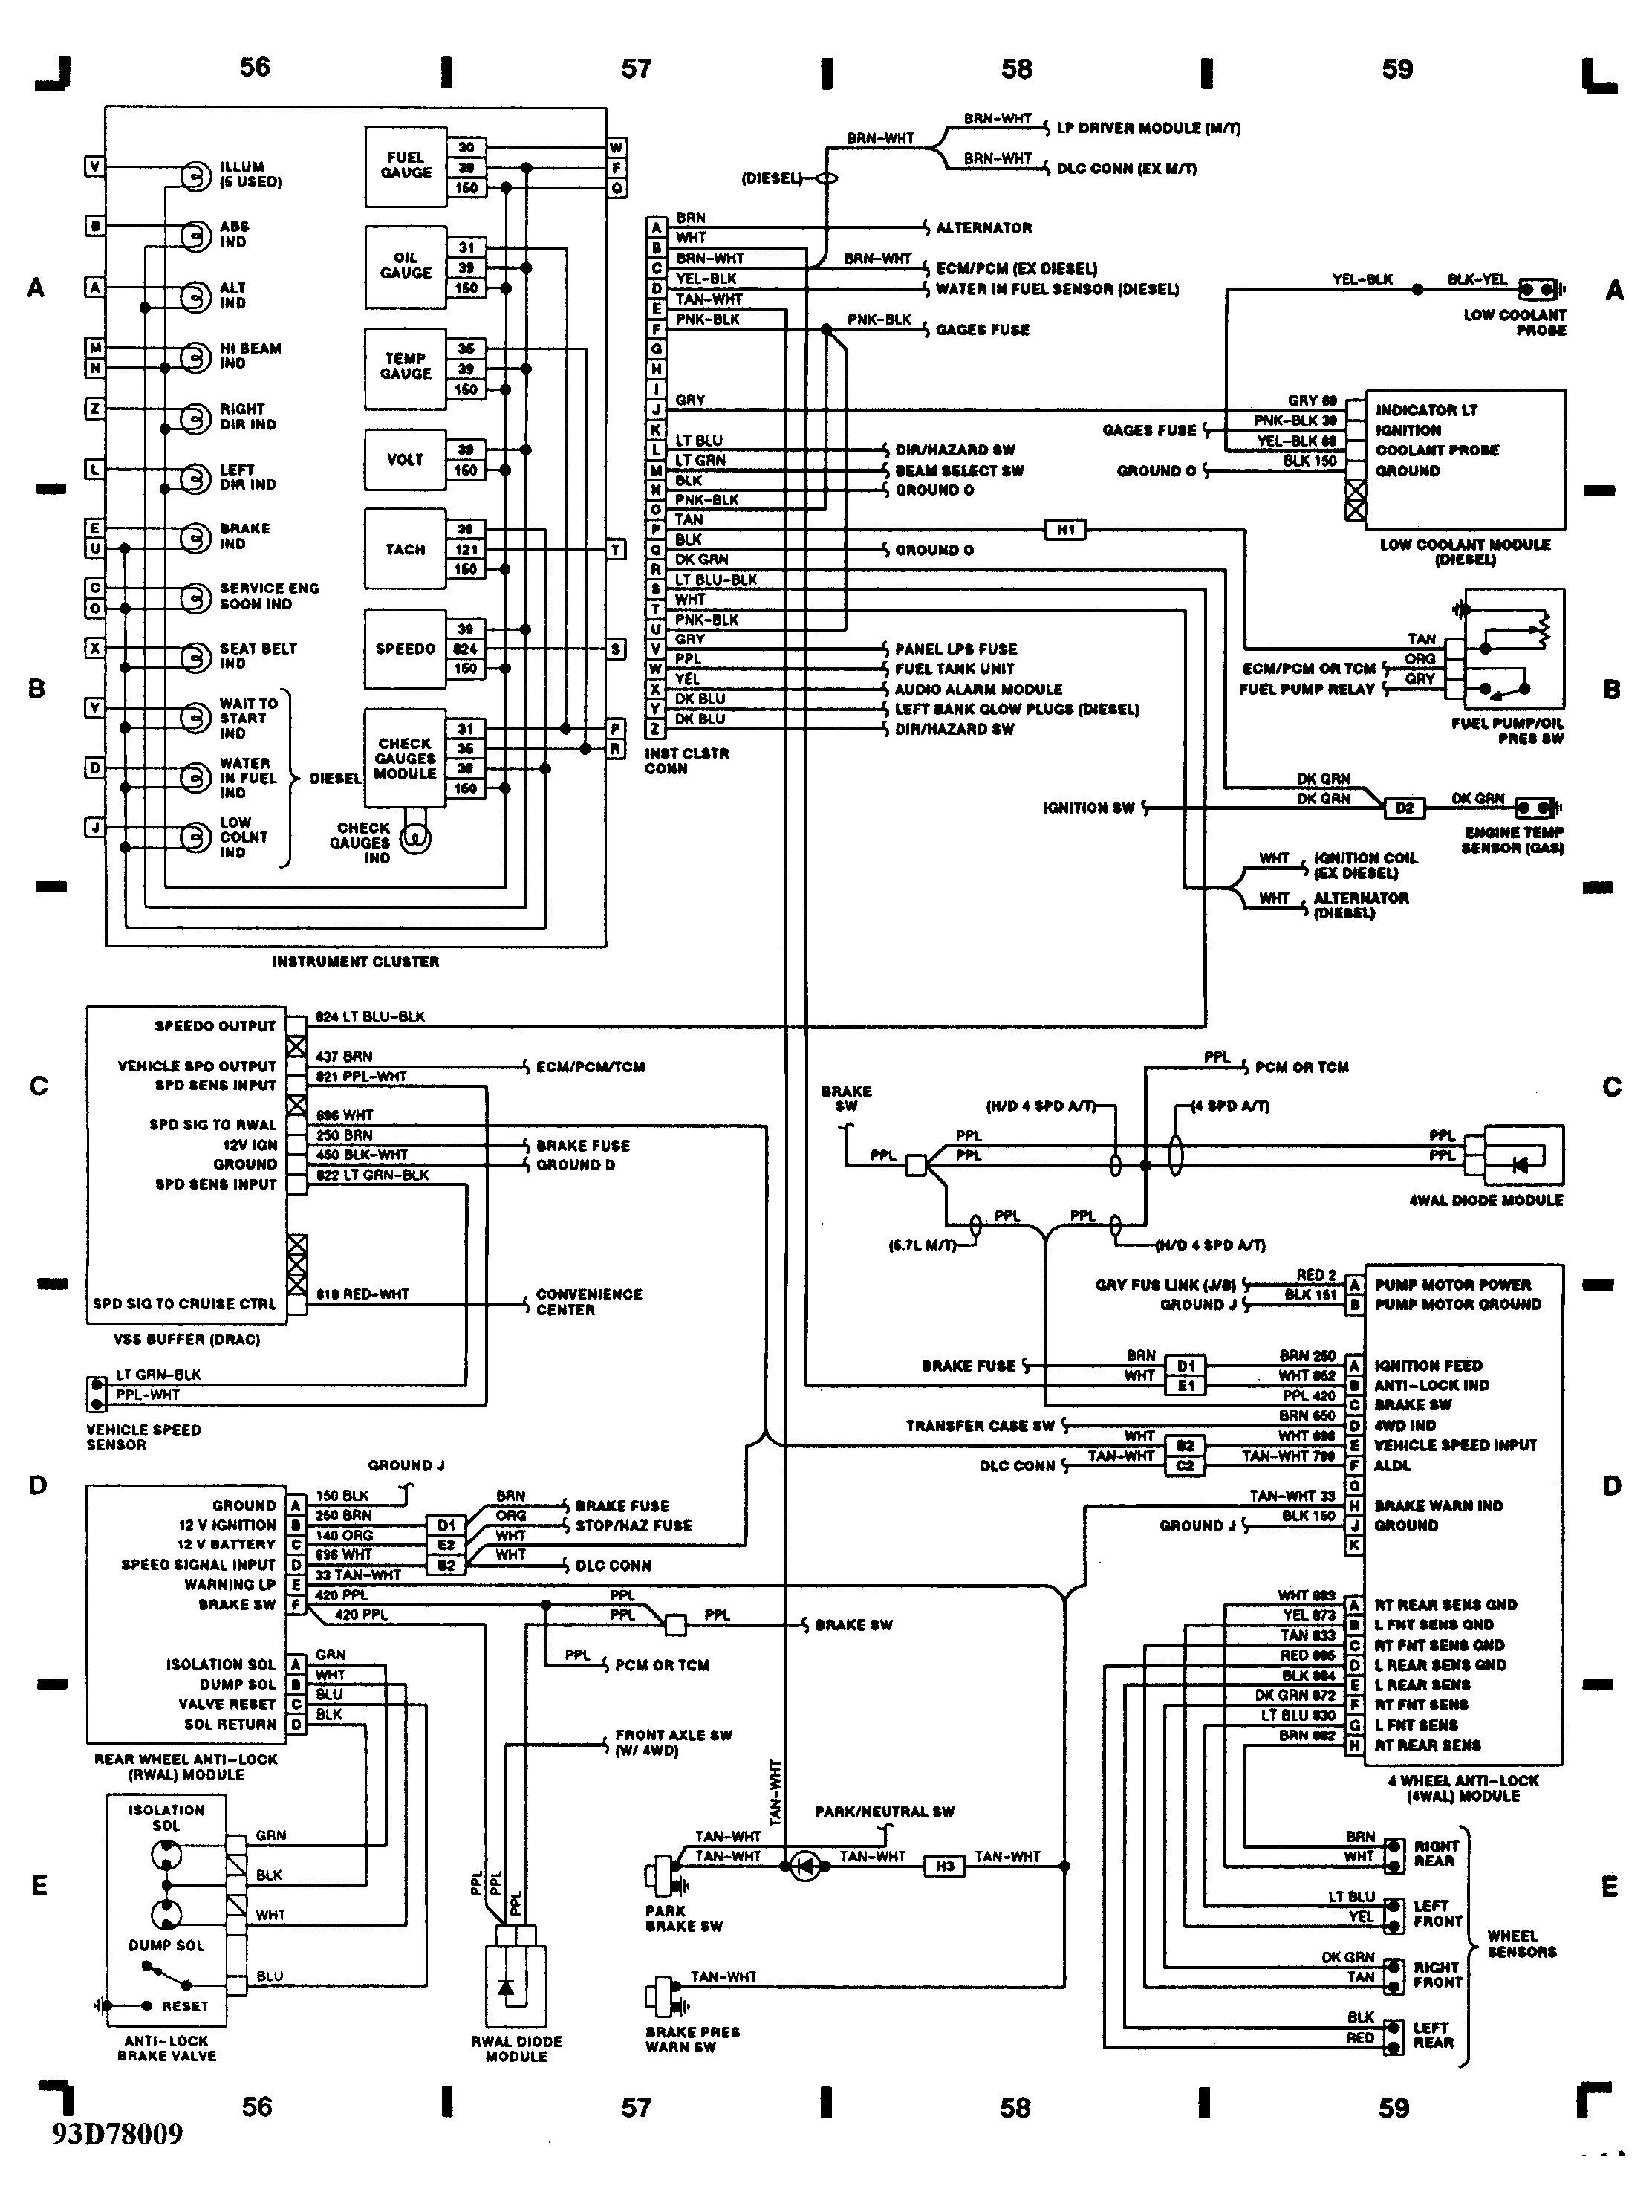 350 Chevy Engine Diagram 5 7 Liter Chevy Engine Diagram 2 Of 350 Chevy Engine Diagram